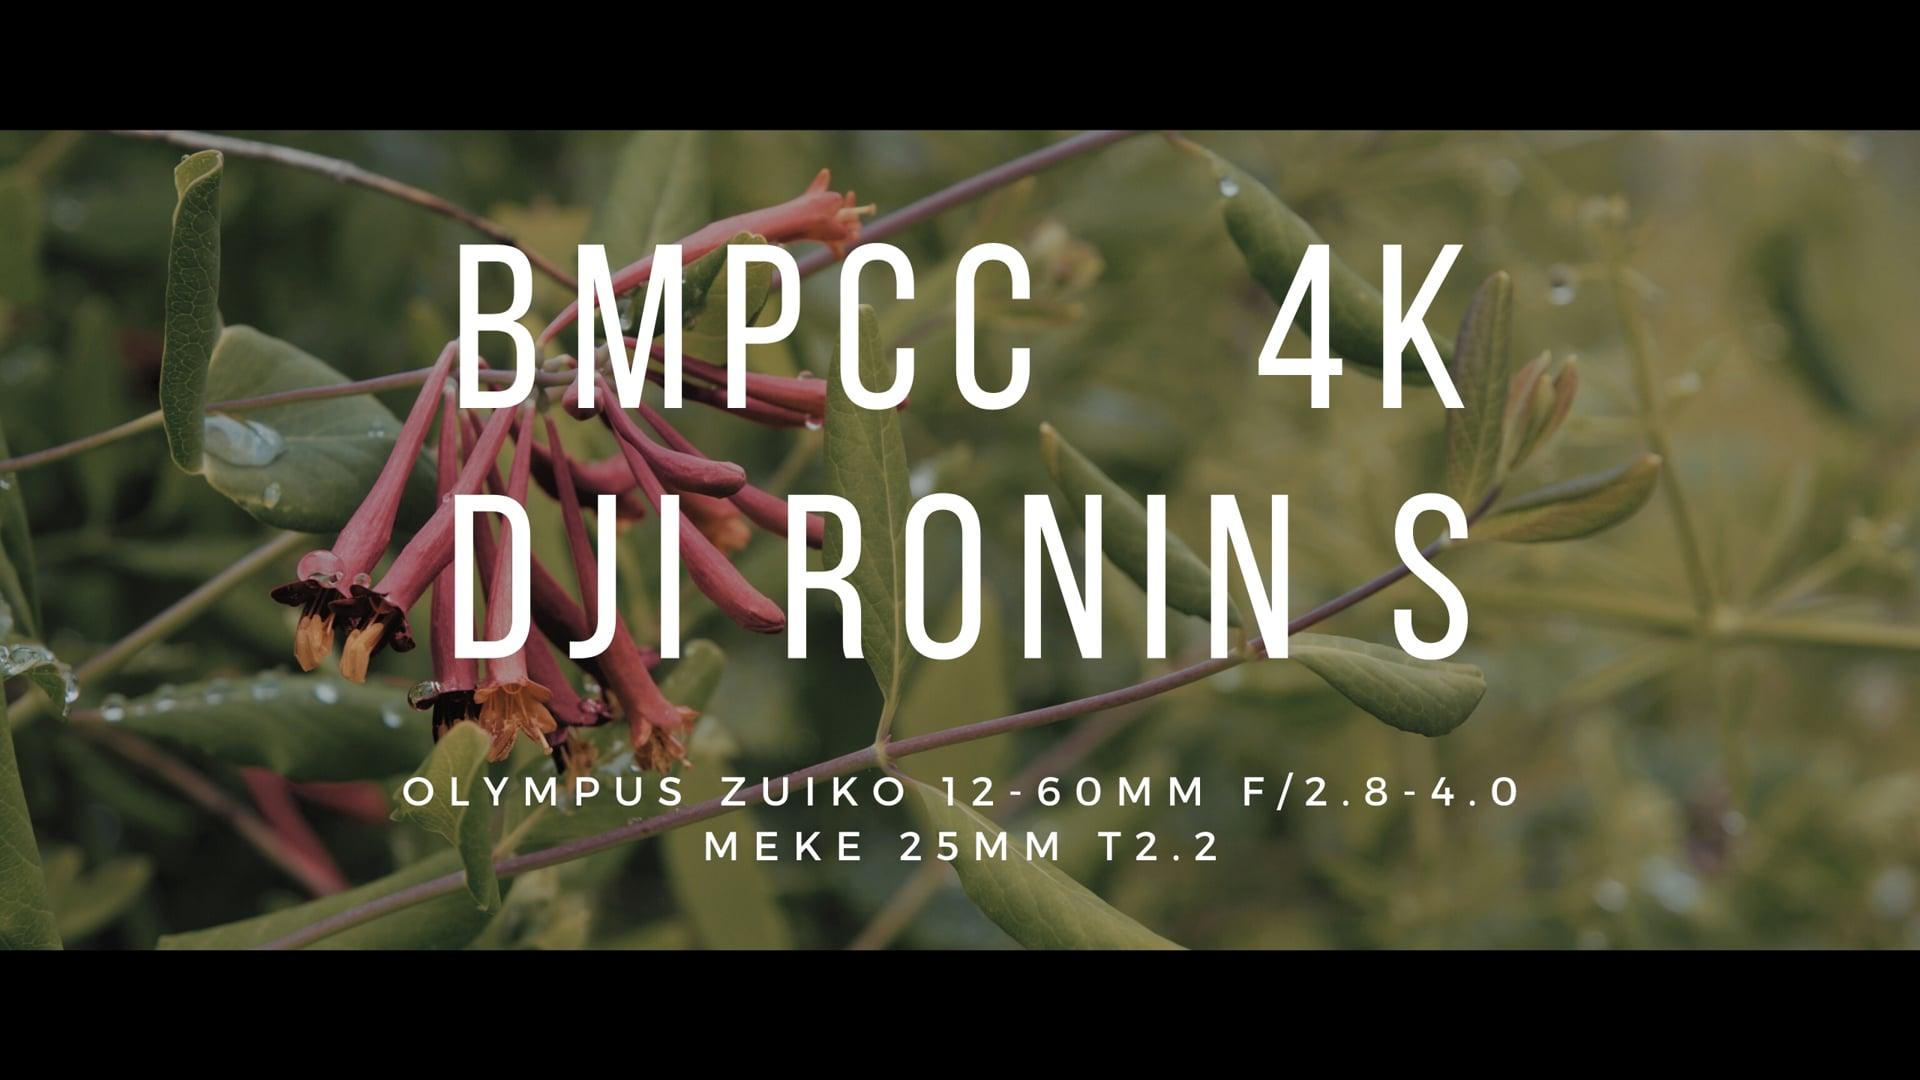 BMPCC4k - DJI RONIN S - Olympus Zuiko 12-60mm f/2.8-4.0